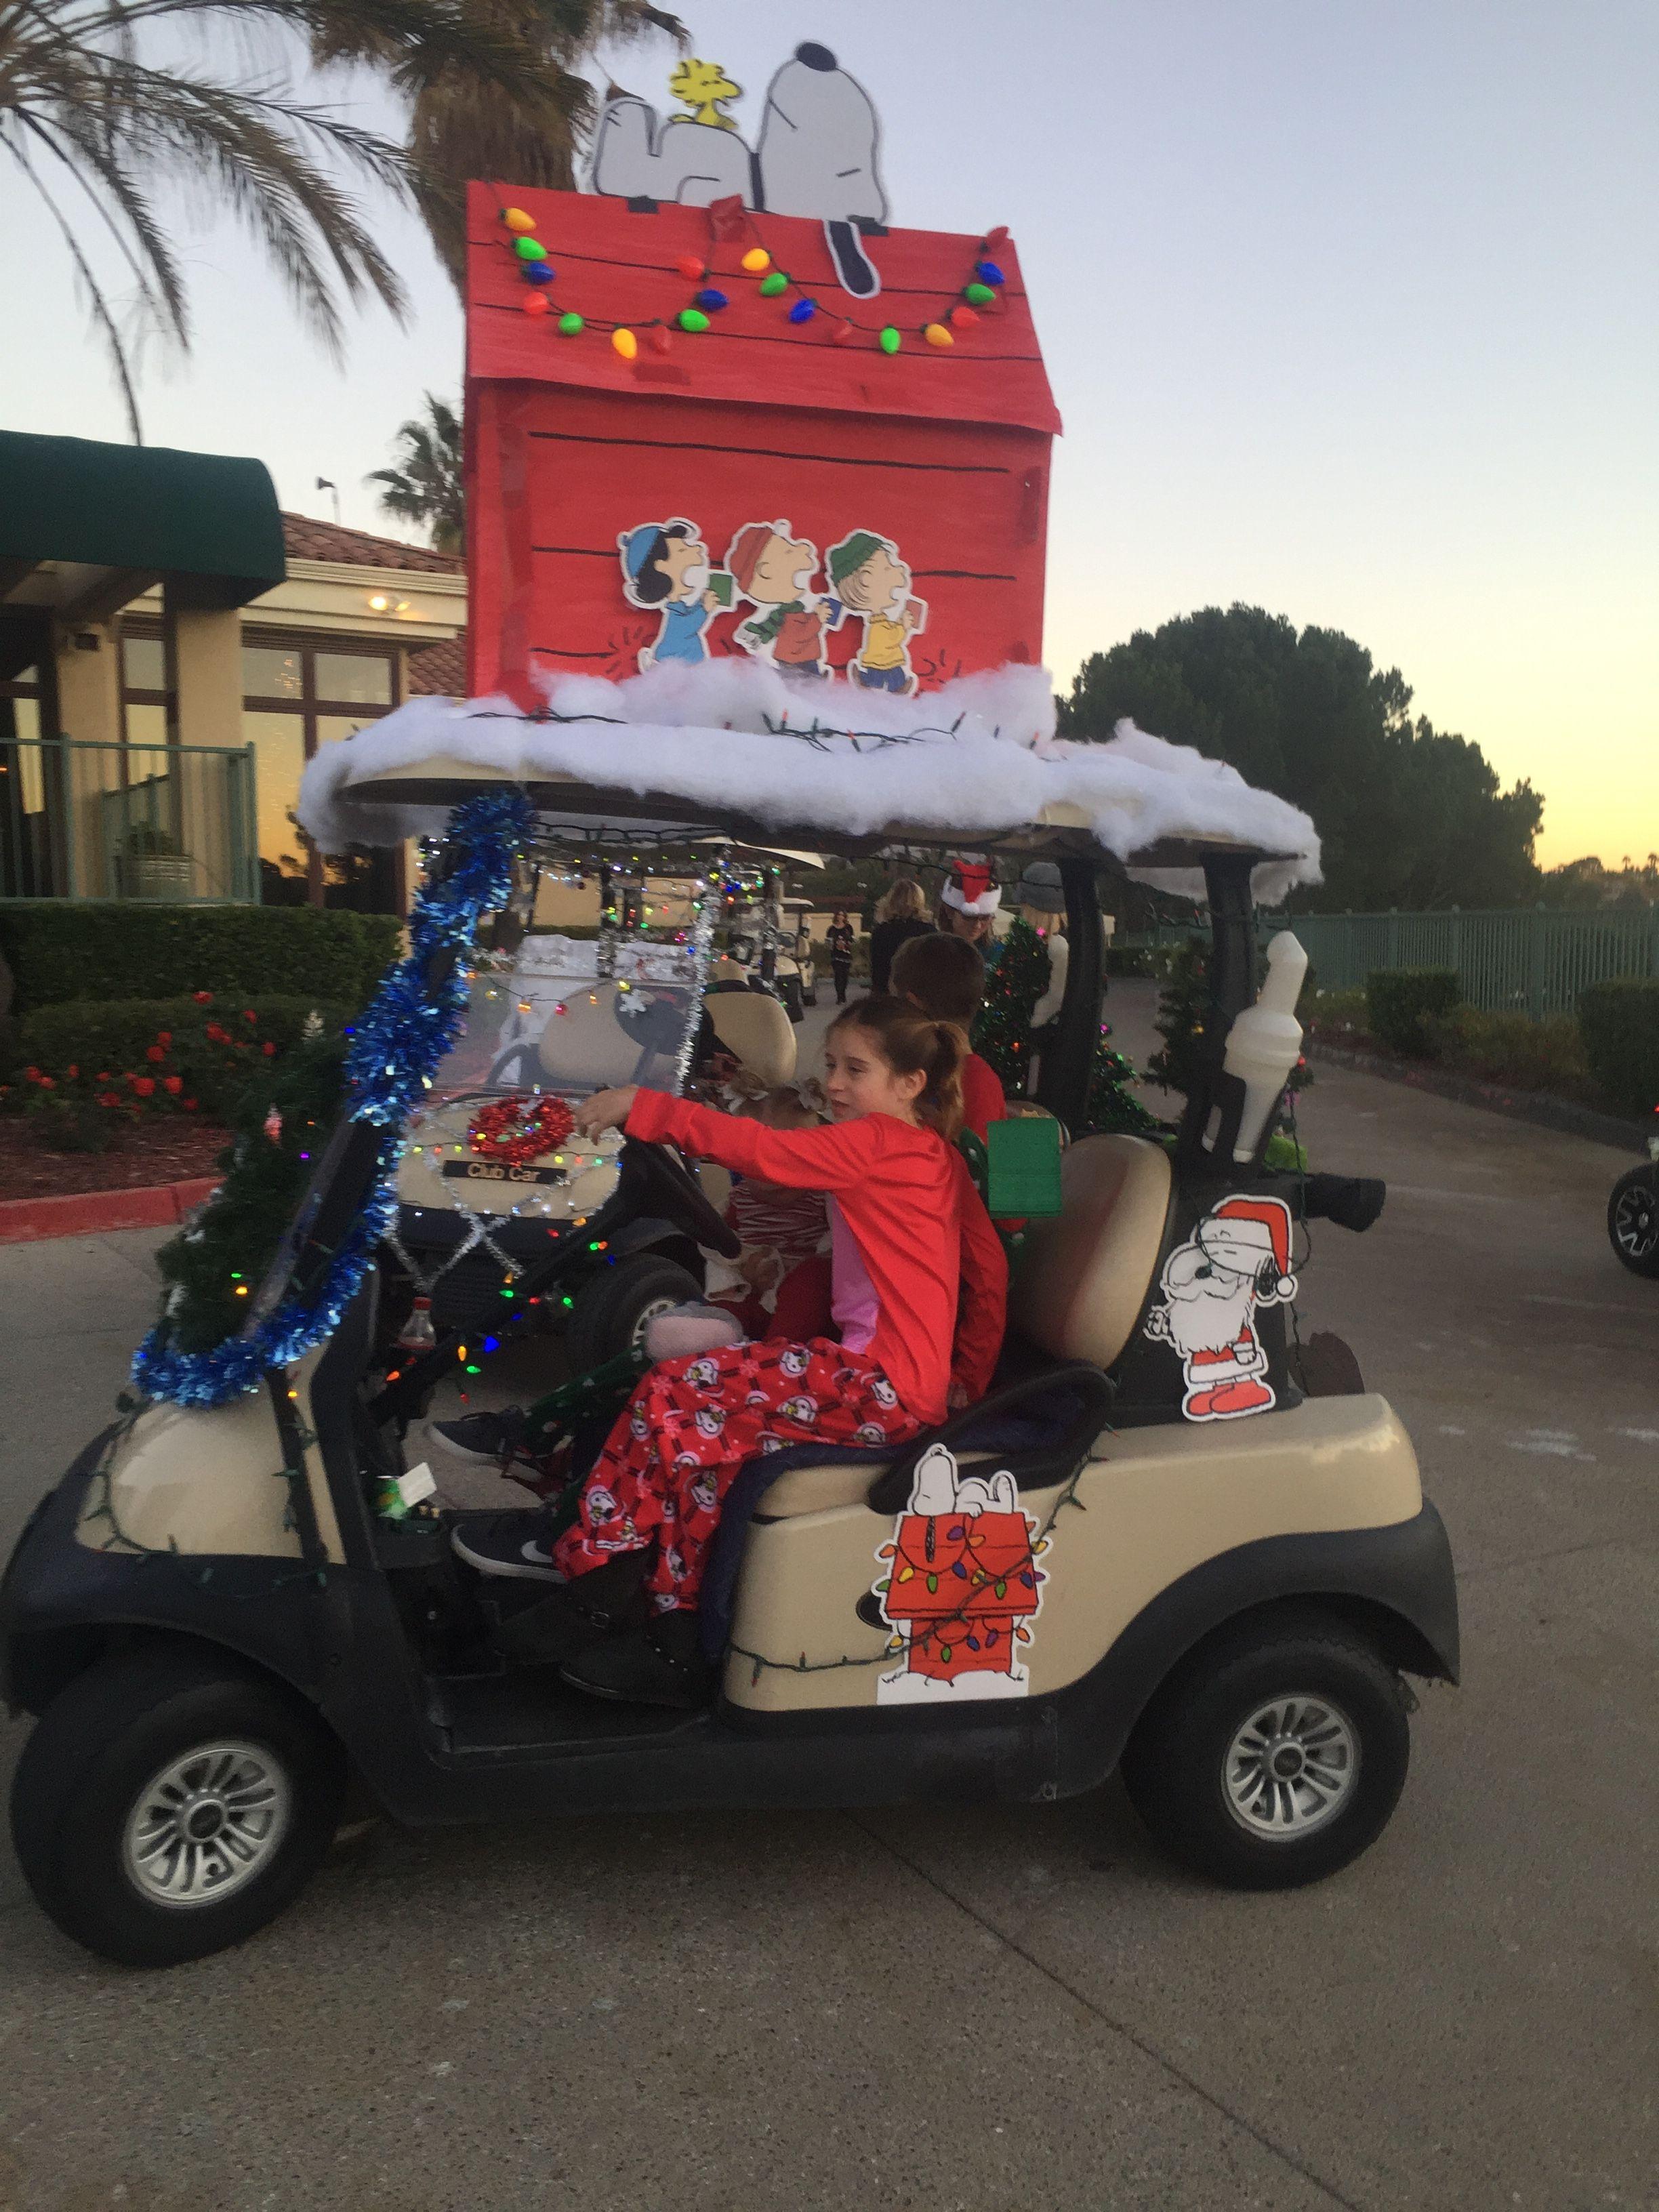 Snoppy Golf Cart Christmas Parade Golf Cart Decorations Golf Carts Christmas Golf